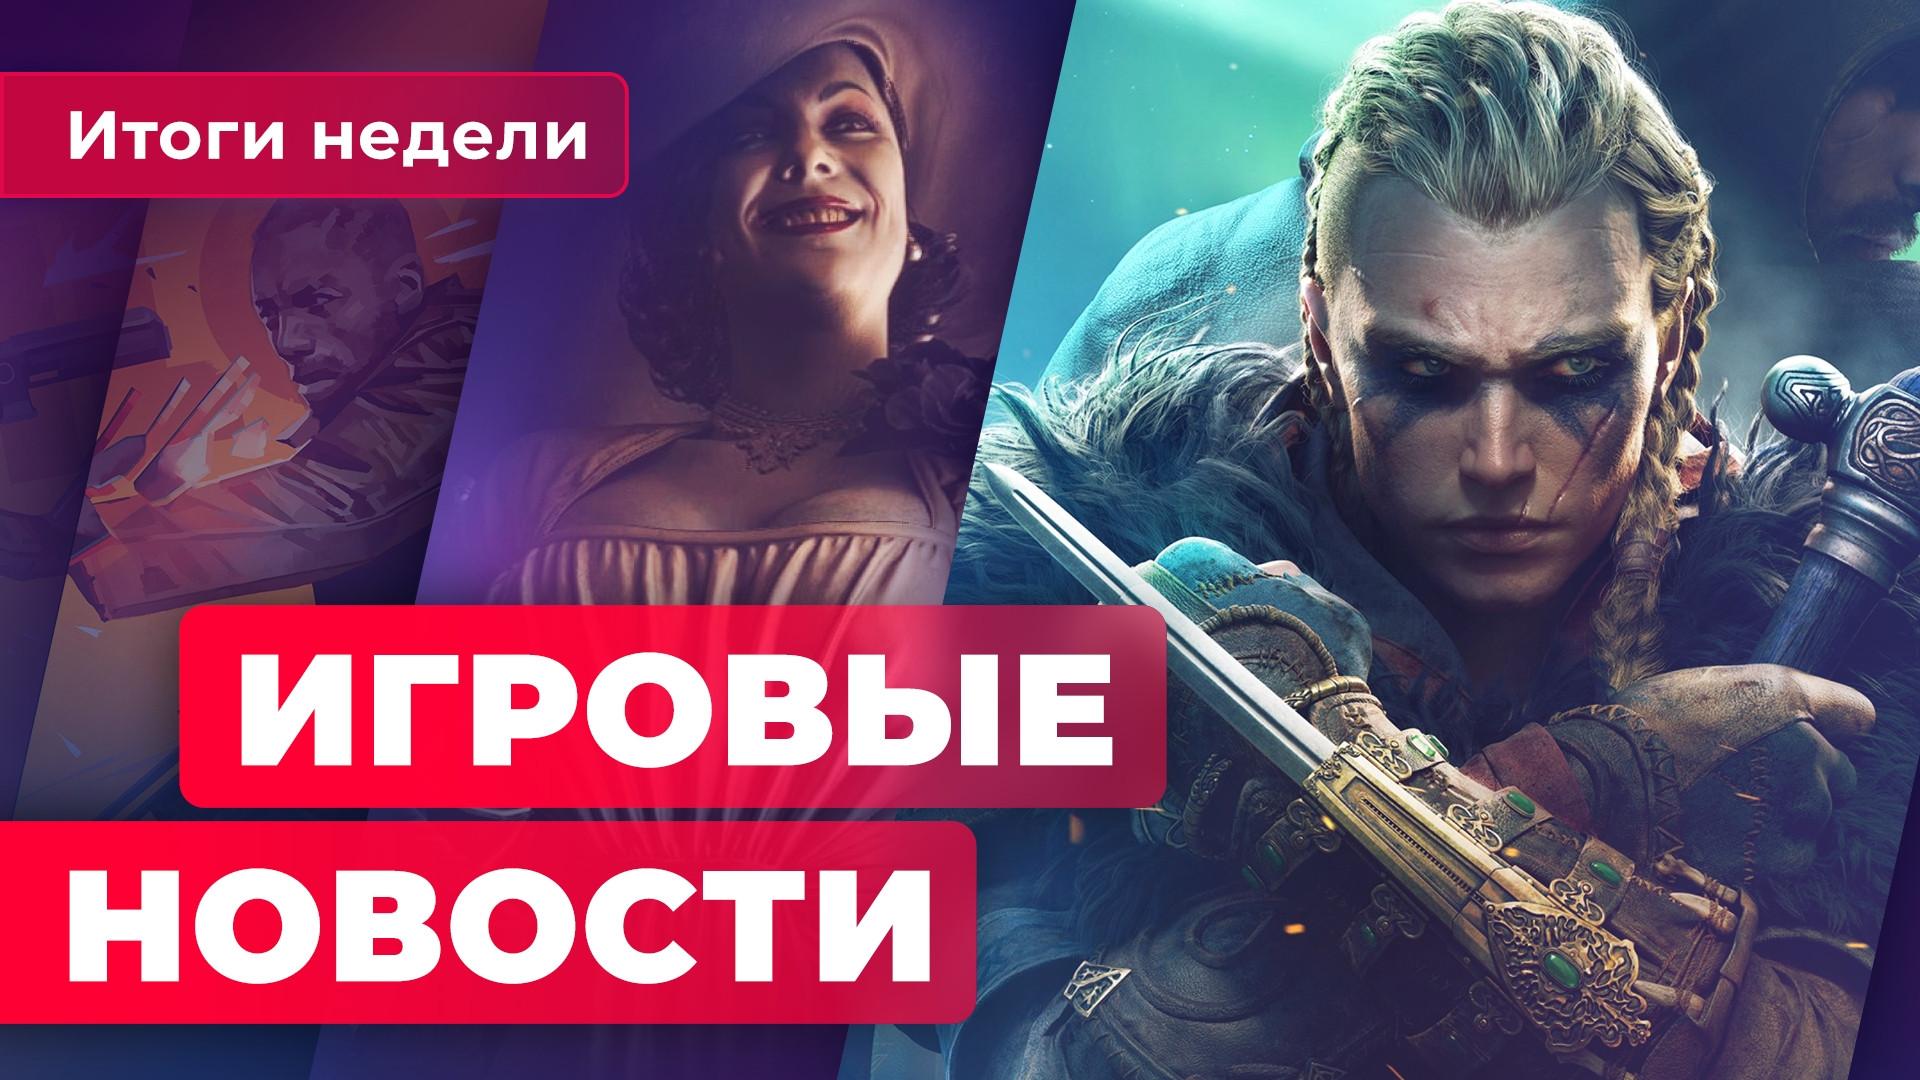 ИГРОВЫЕ НОВОСТИ | E3 2021, Assassin's Creed про крестоносцев, Deadly Premonition2 на ПК